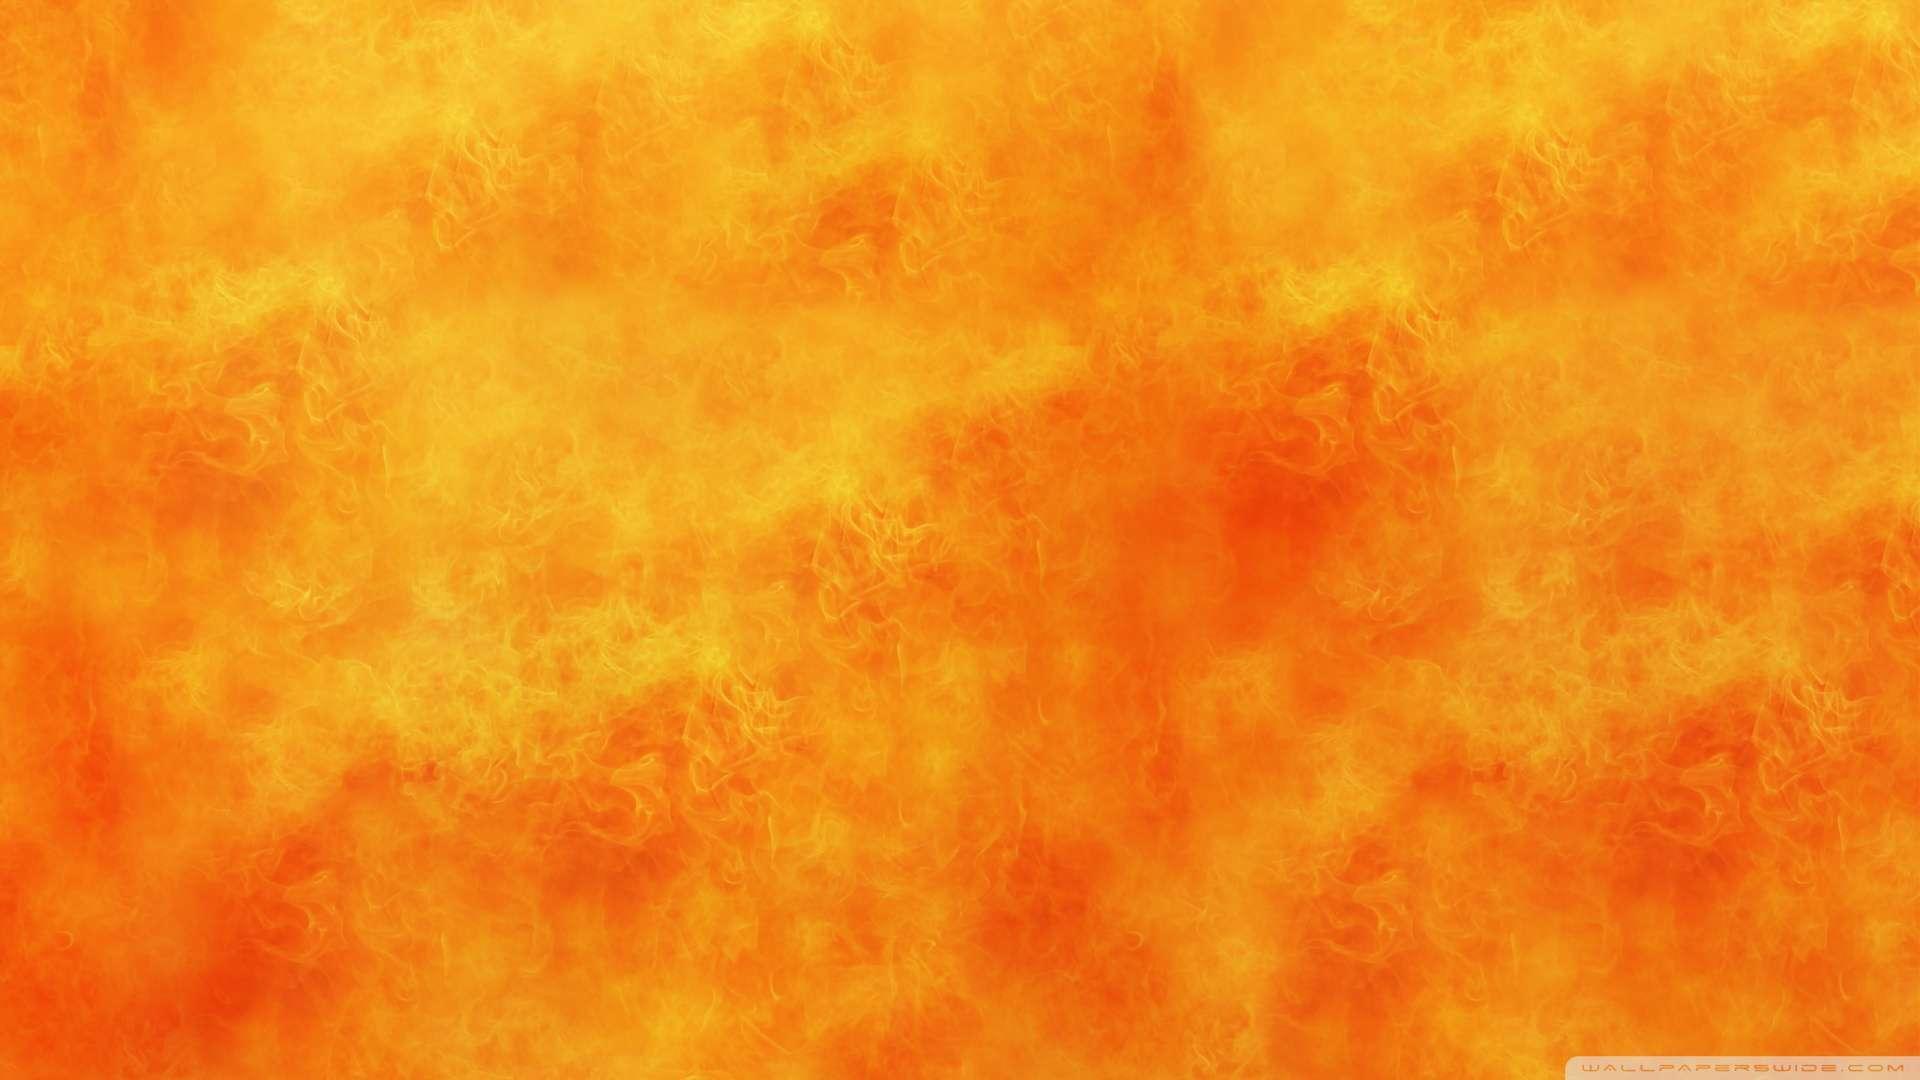 Fire Desktop HD Wallpaper - WallpaperSafari